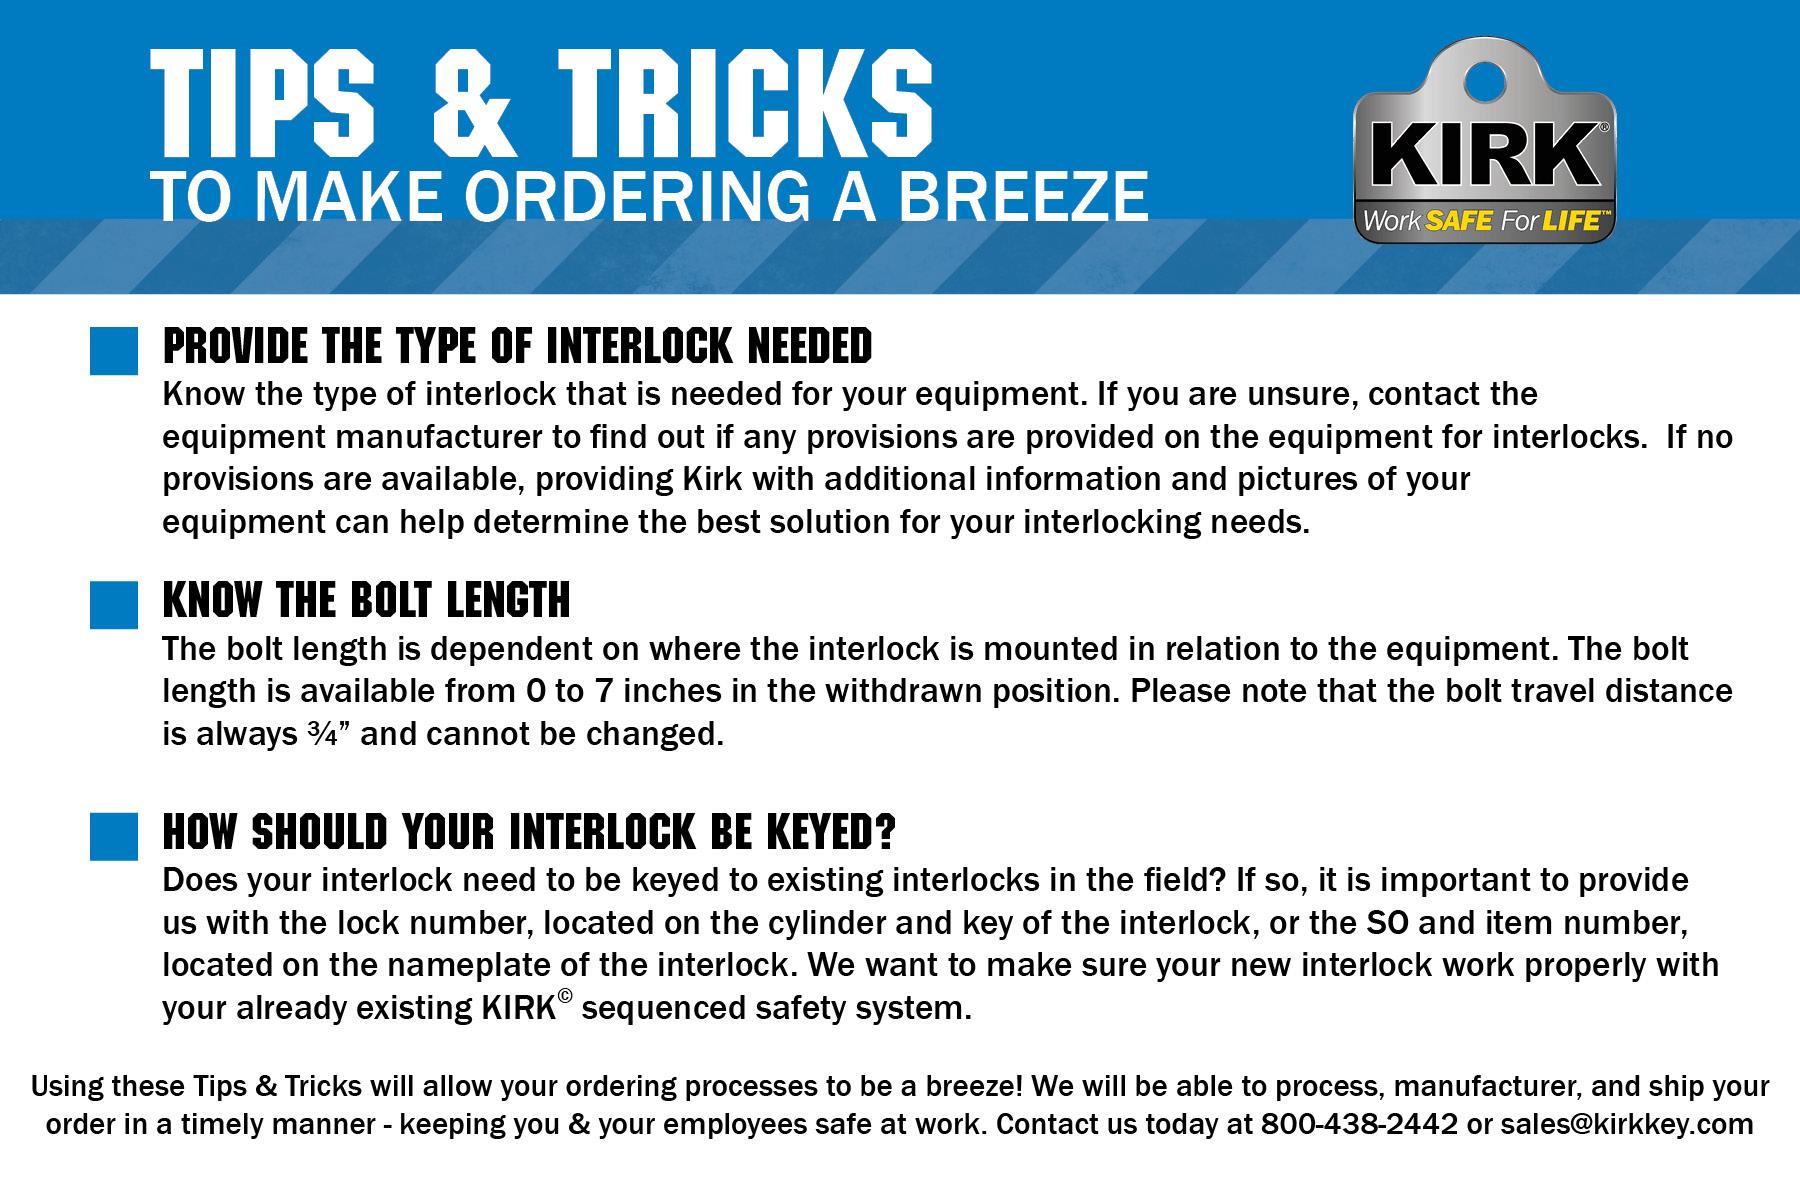 07bbc0_8ab0d9a3379a4688938f410b0e7a13b6~mv2_d_1800_1200_s_2 tips & tricks to make ordering a breeze kirk� the leader in kirk key interlock wiring diagram at panicattacktreatment.co